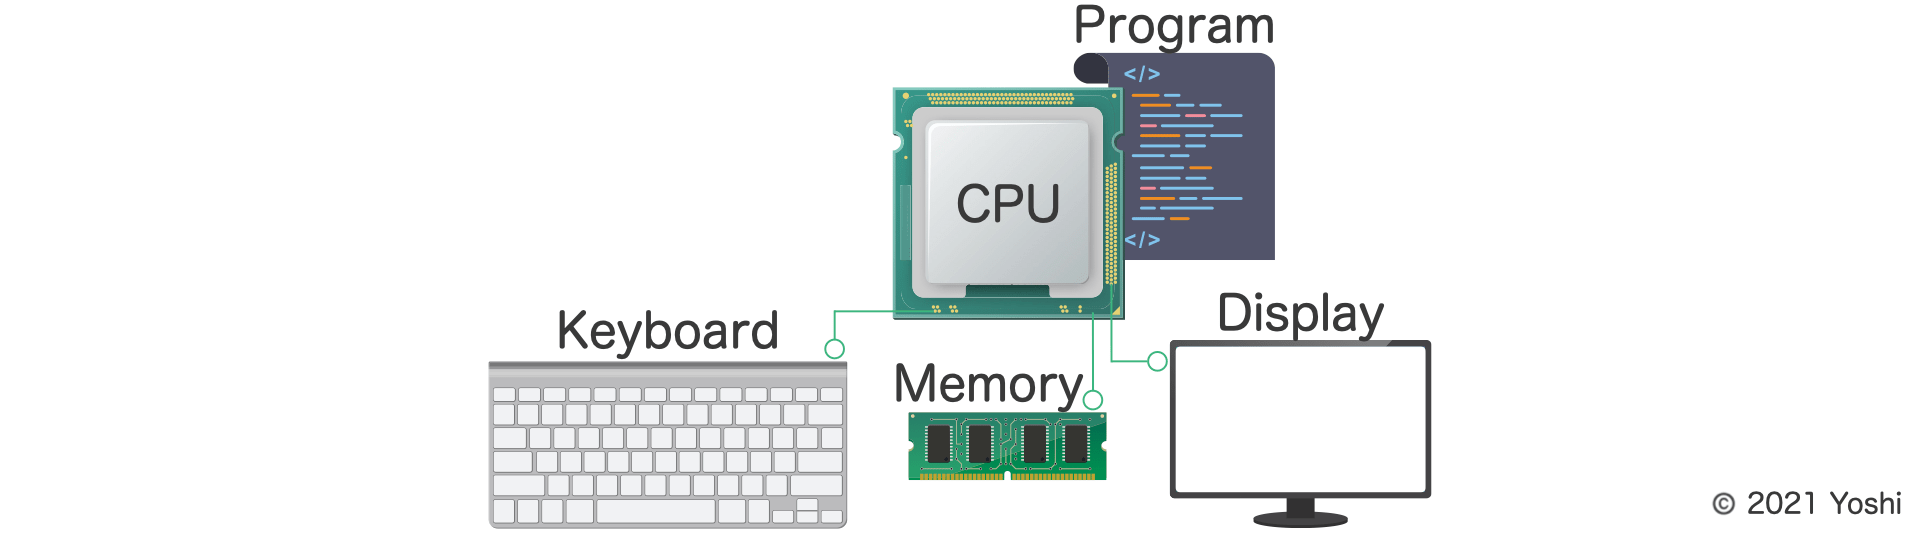 CPU  interprets programs